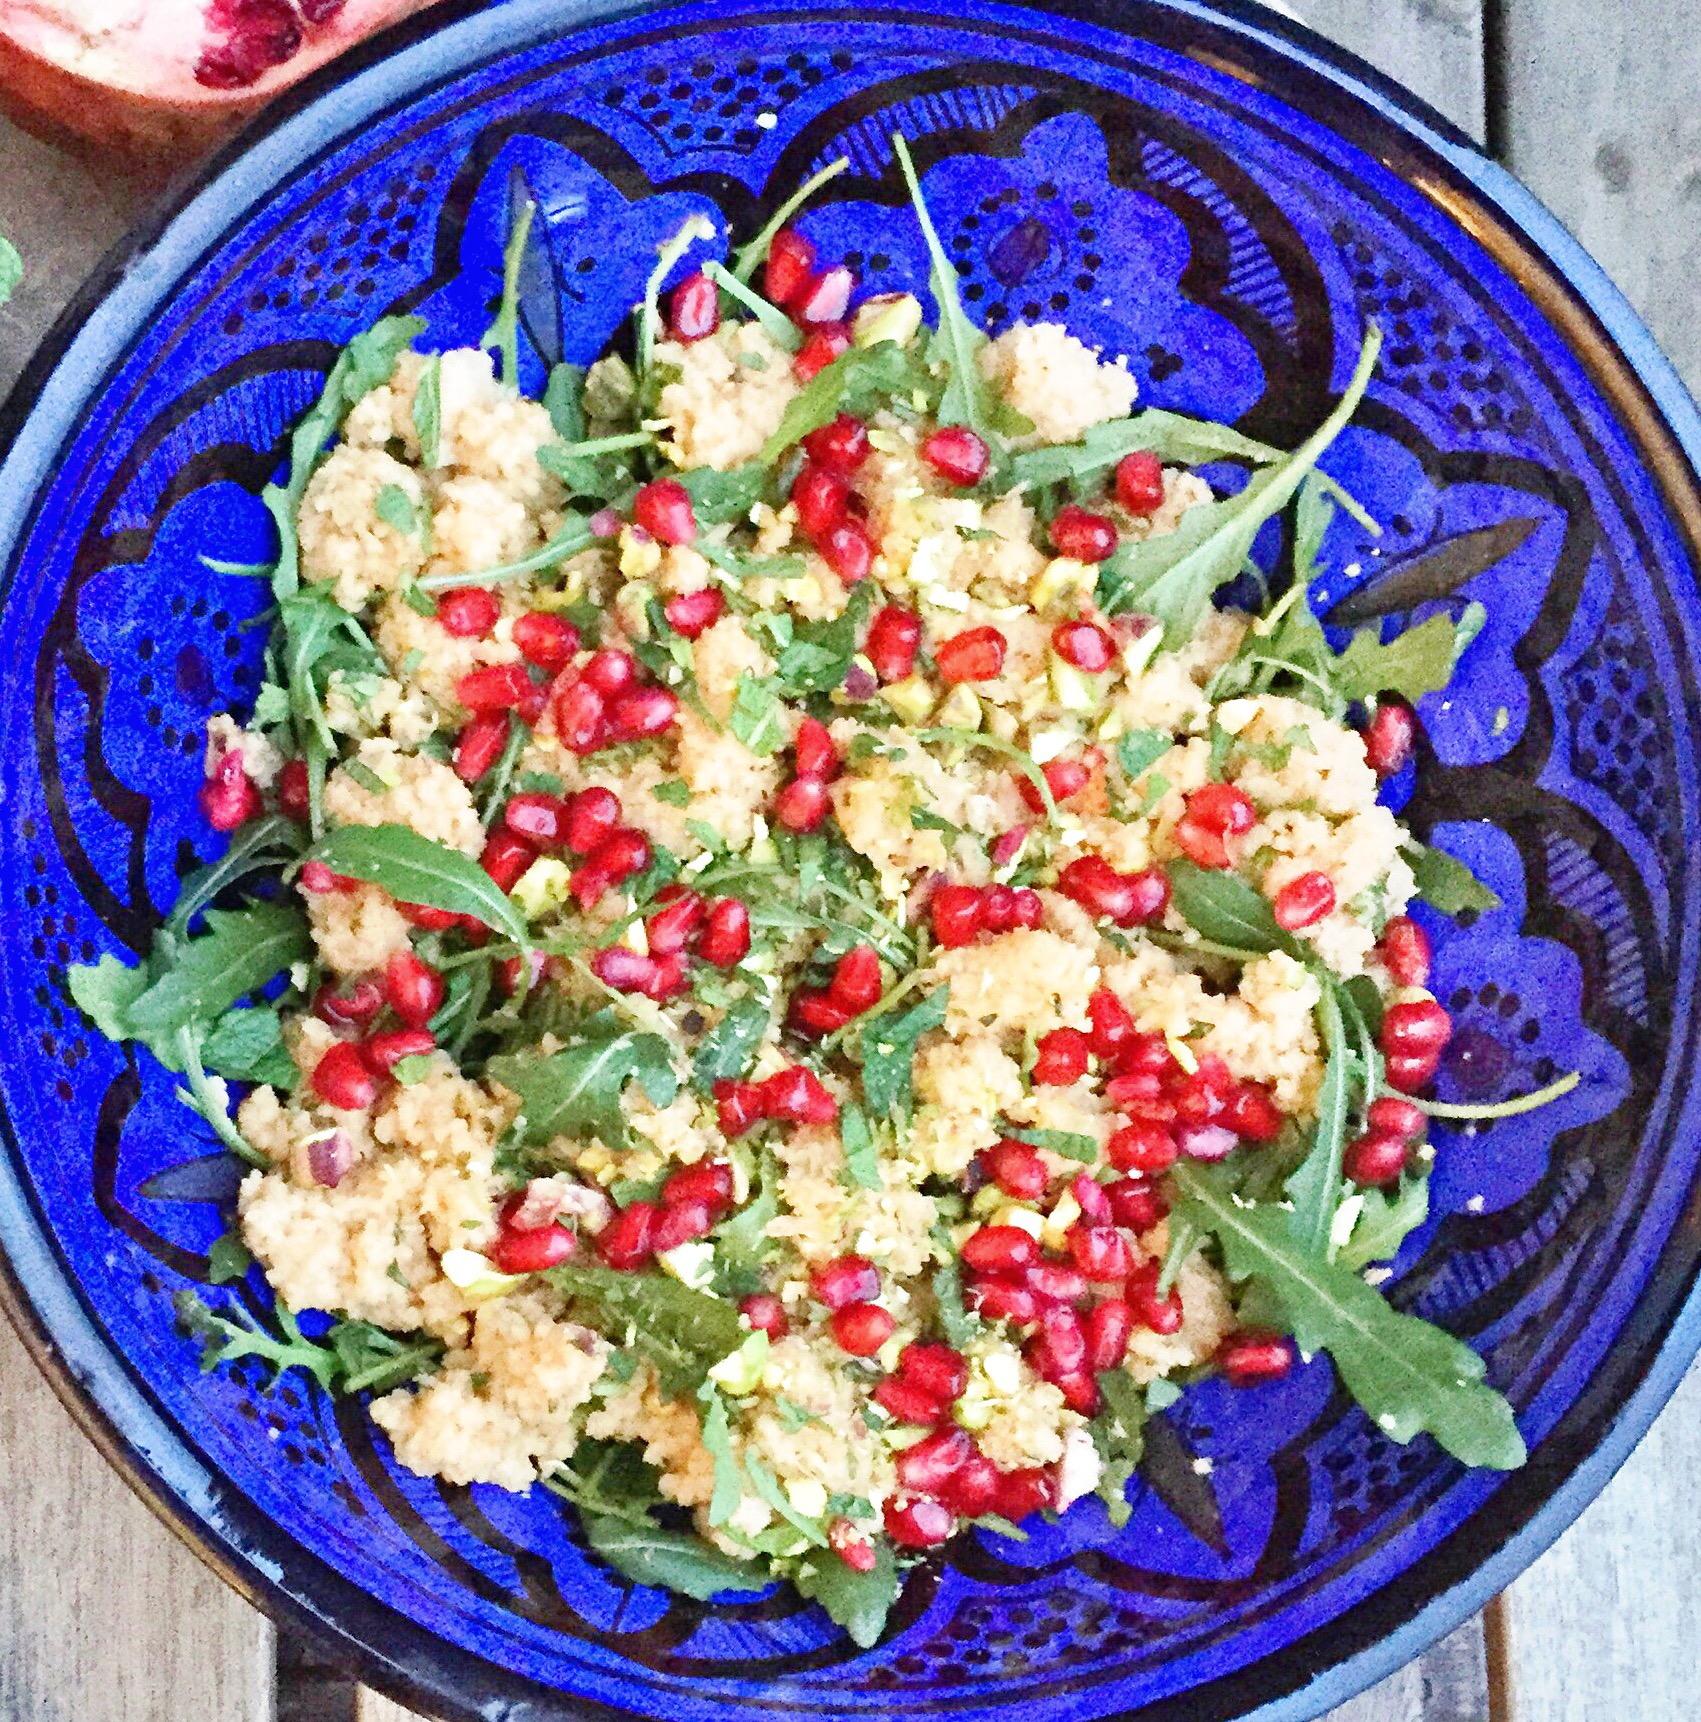 Søndags couscous med granatæble og pistacie